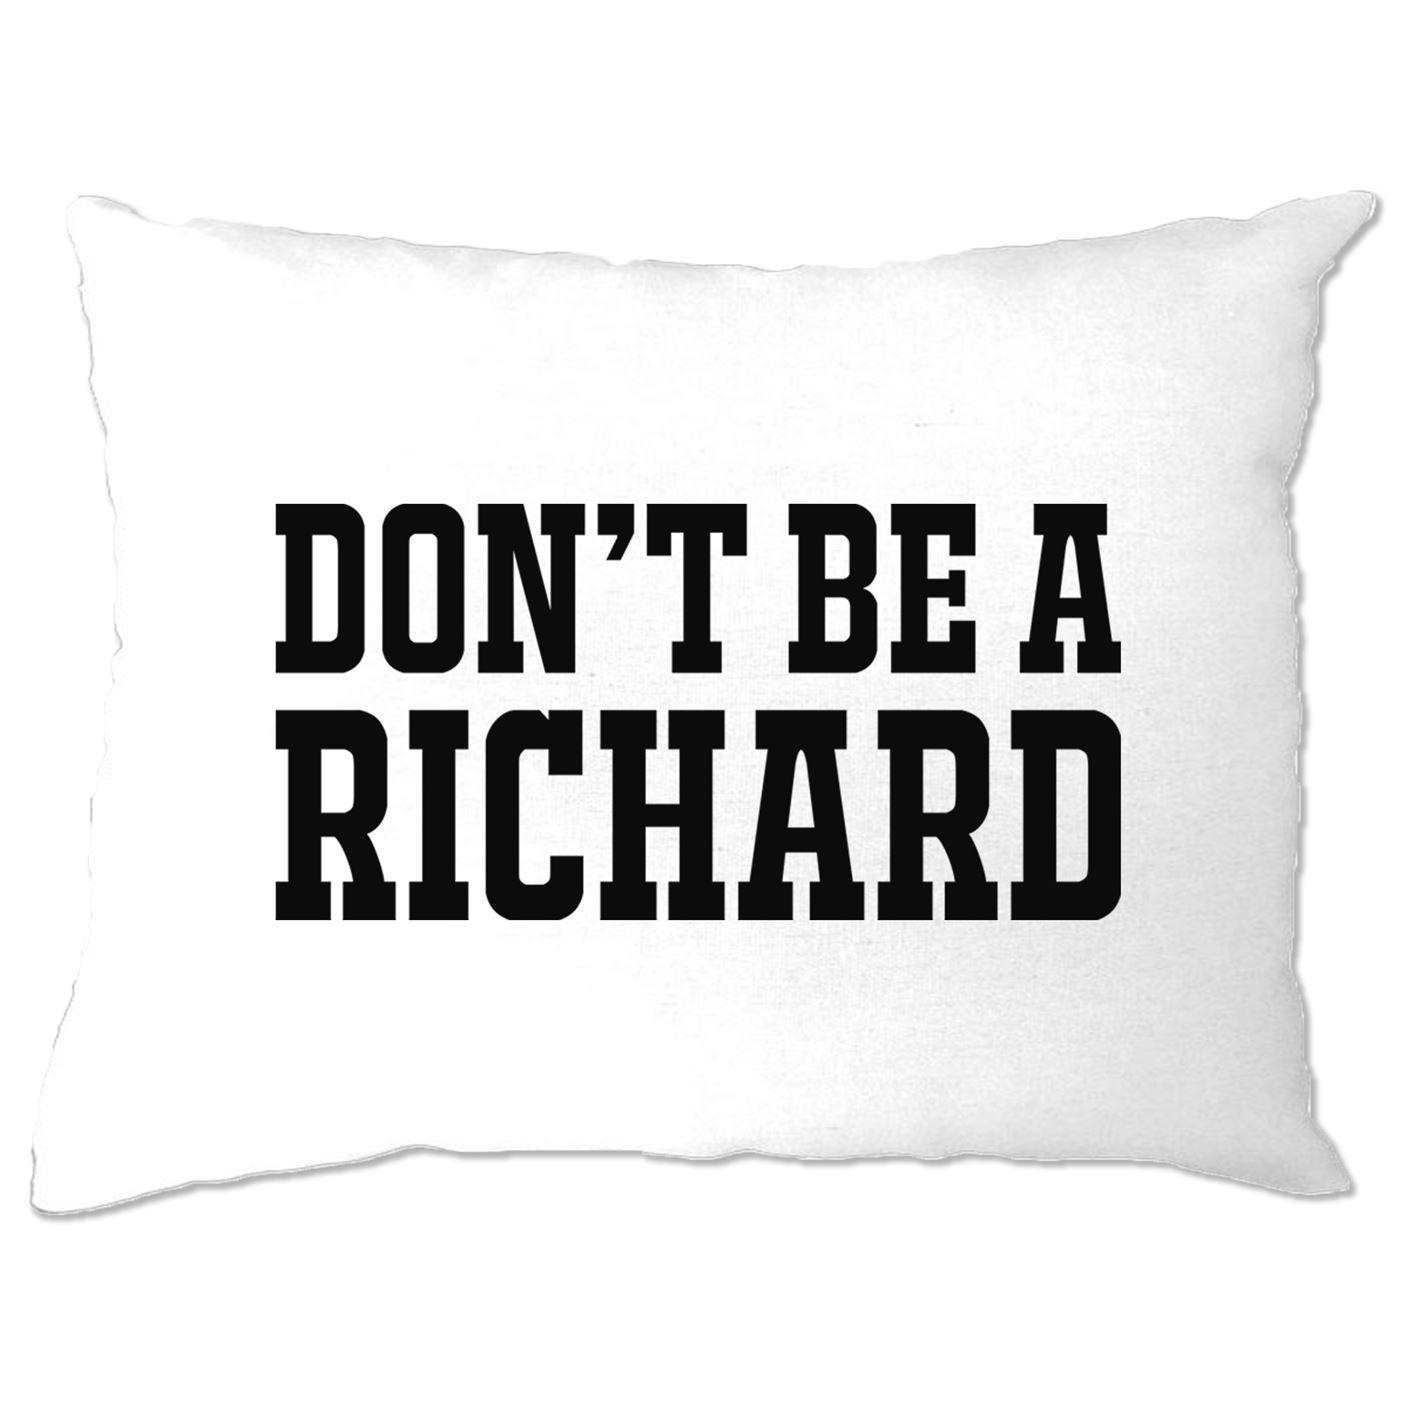 Don't Be a Richard Funny Pillow Case Rude Joke